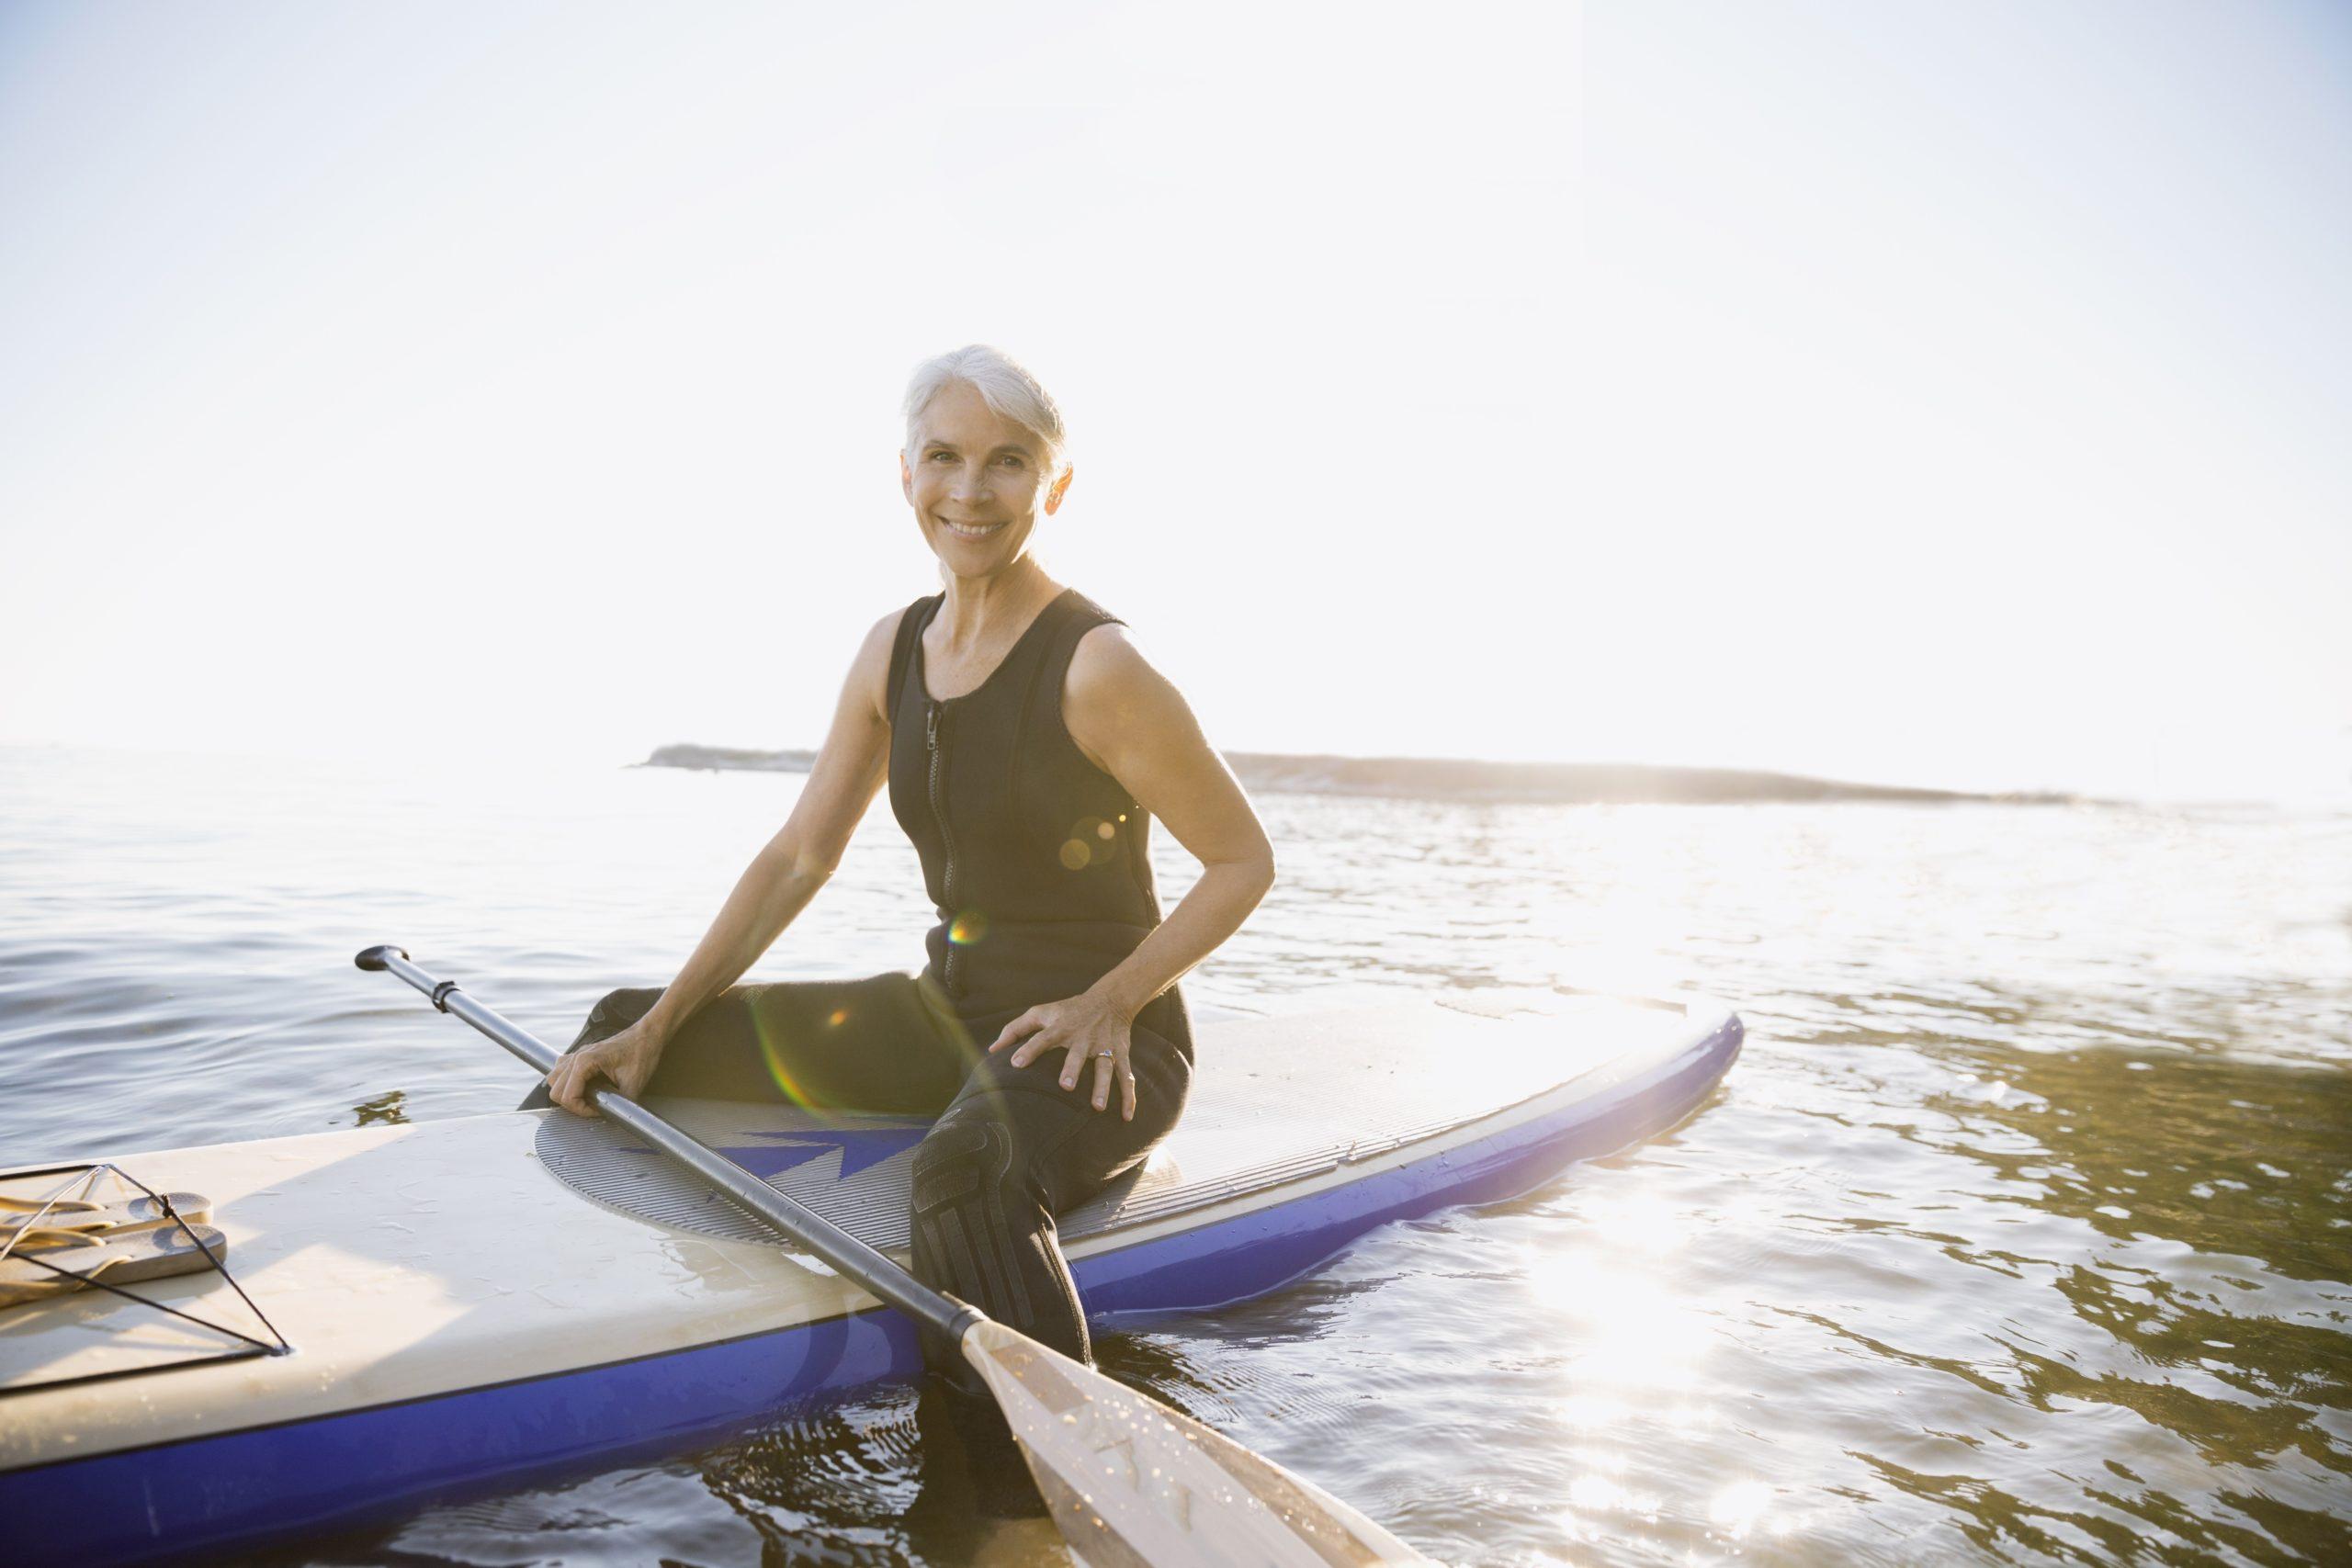 14 Sep 2014 --- Senior woman on paddle board in ocean --- Image by © Hero Images Inc./Hero Images Inc./Corbis